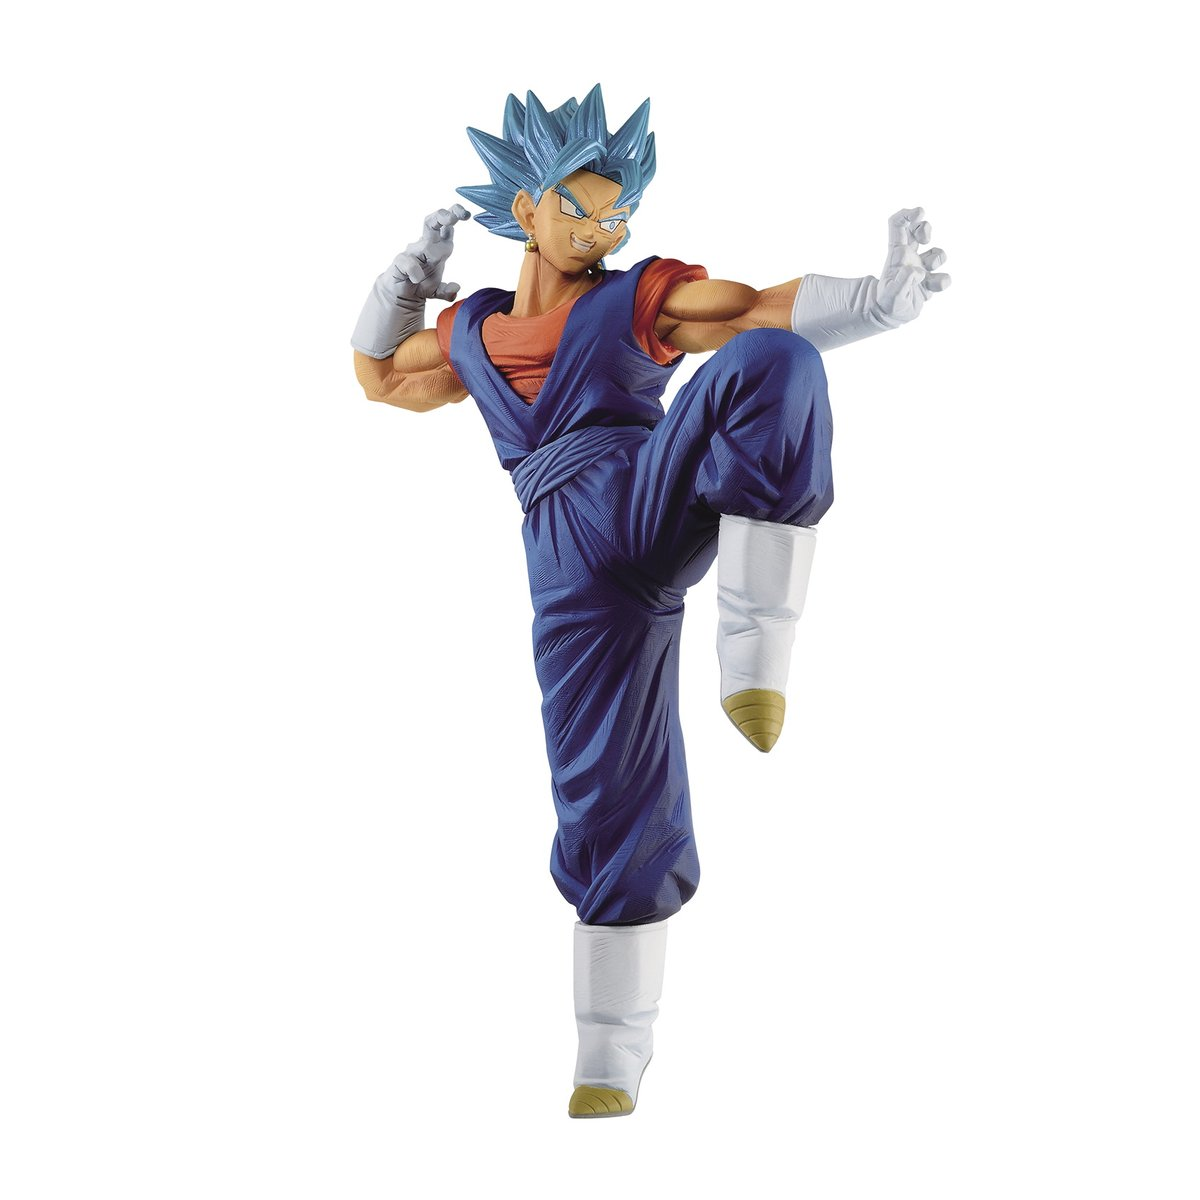 Super Saiyan God Super Saiyan Vegito Figure, Dragon Ball Son Goku Fes!!, Vol 14., Banpresto